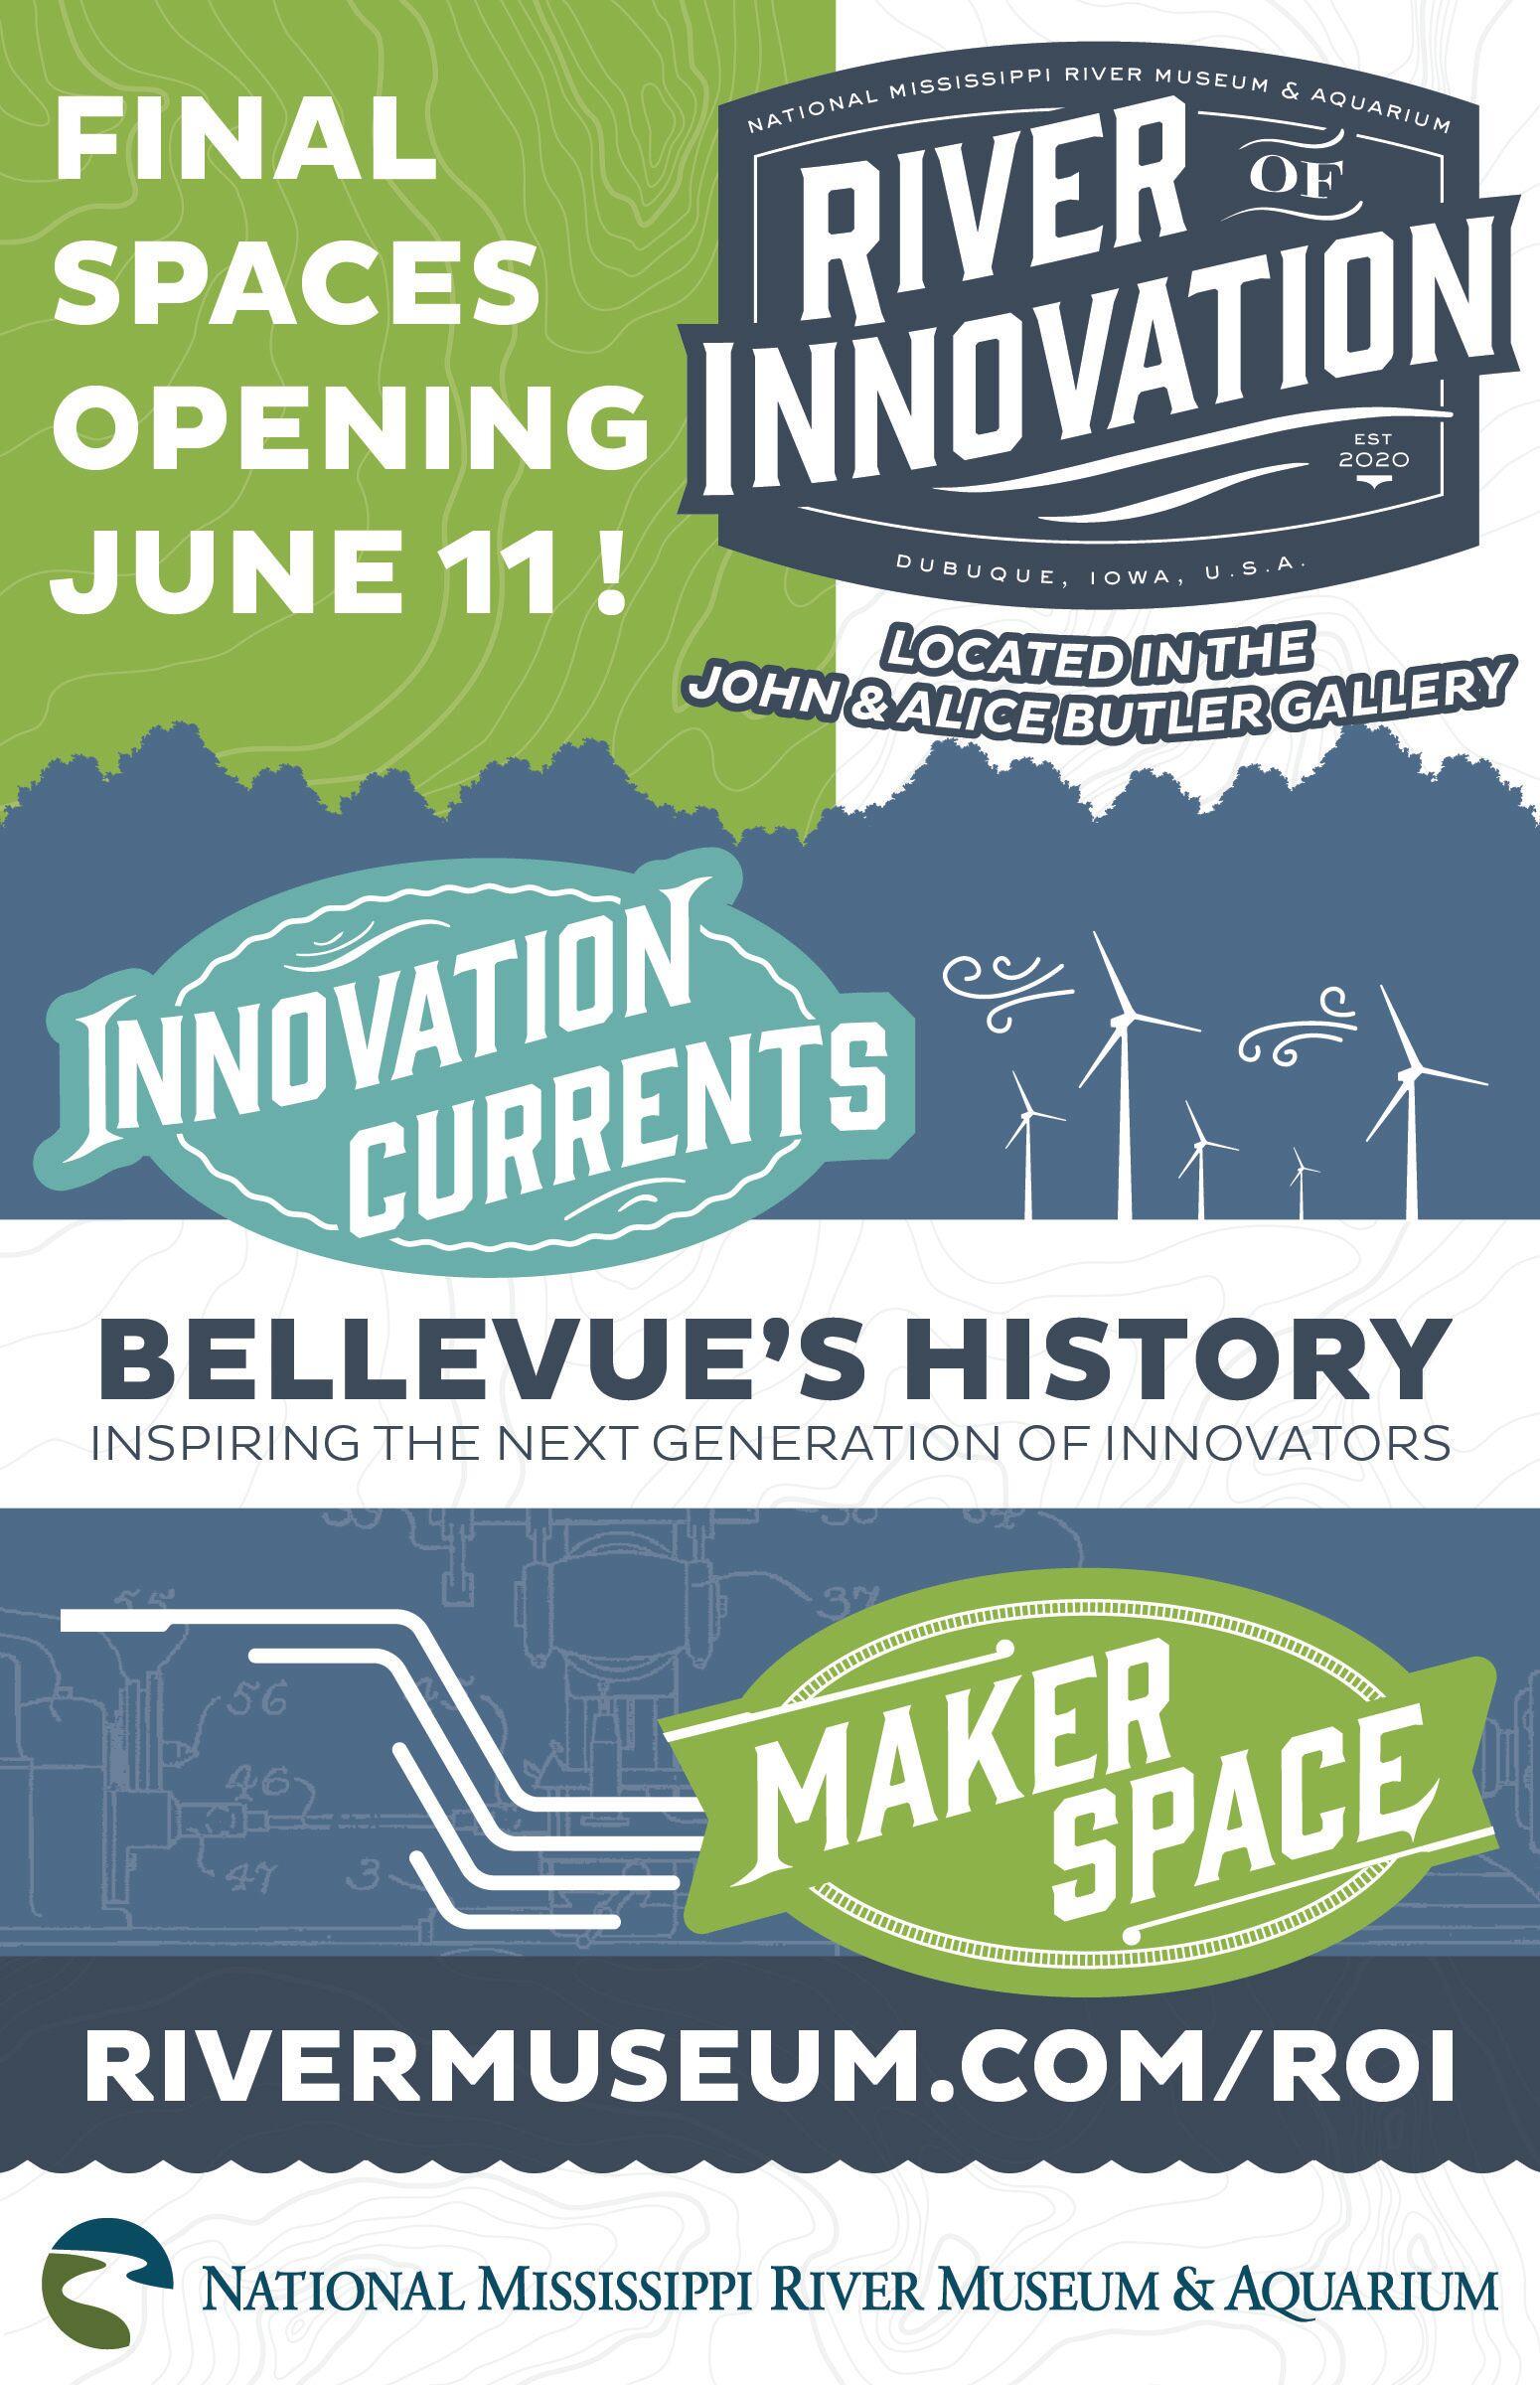 River of Innovation